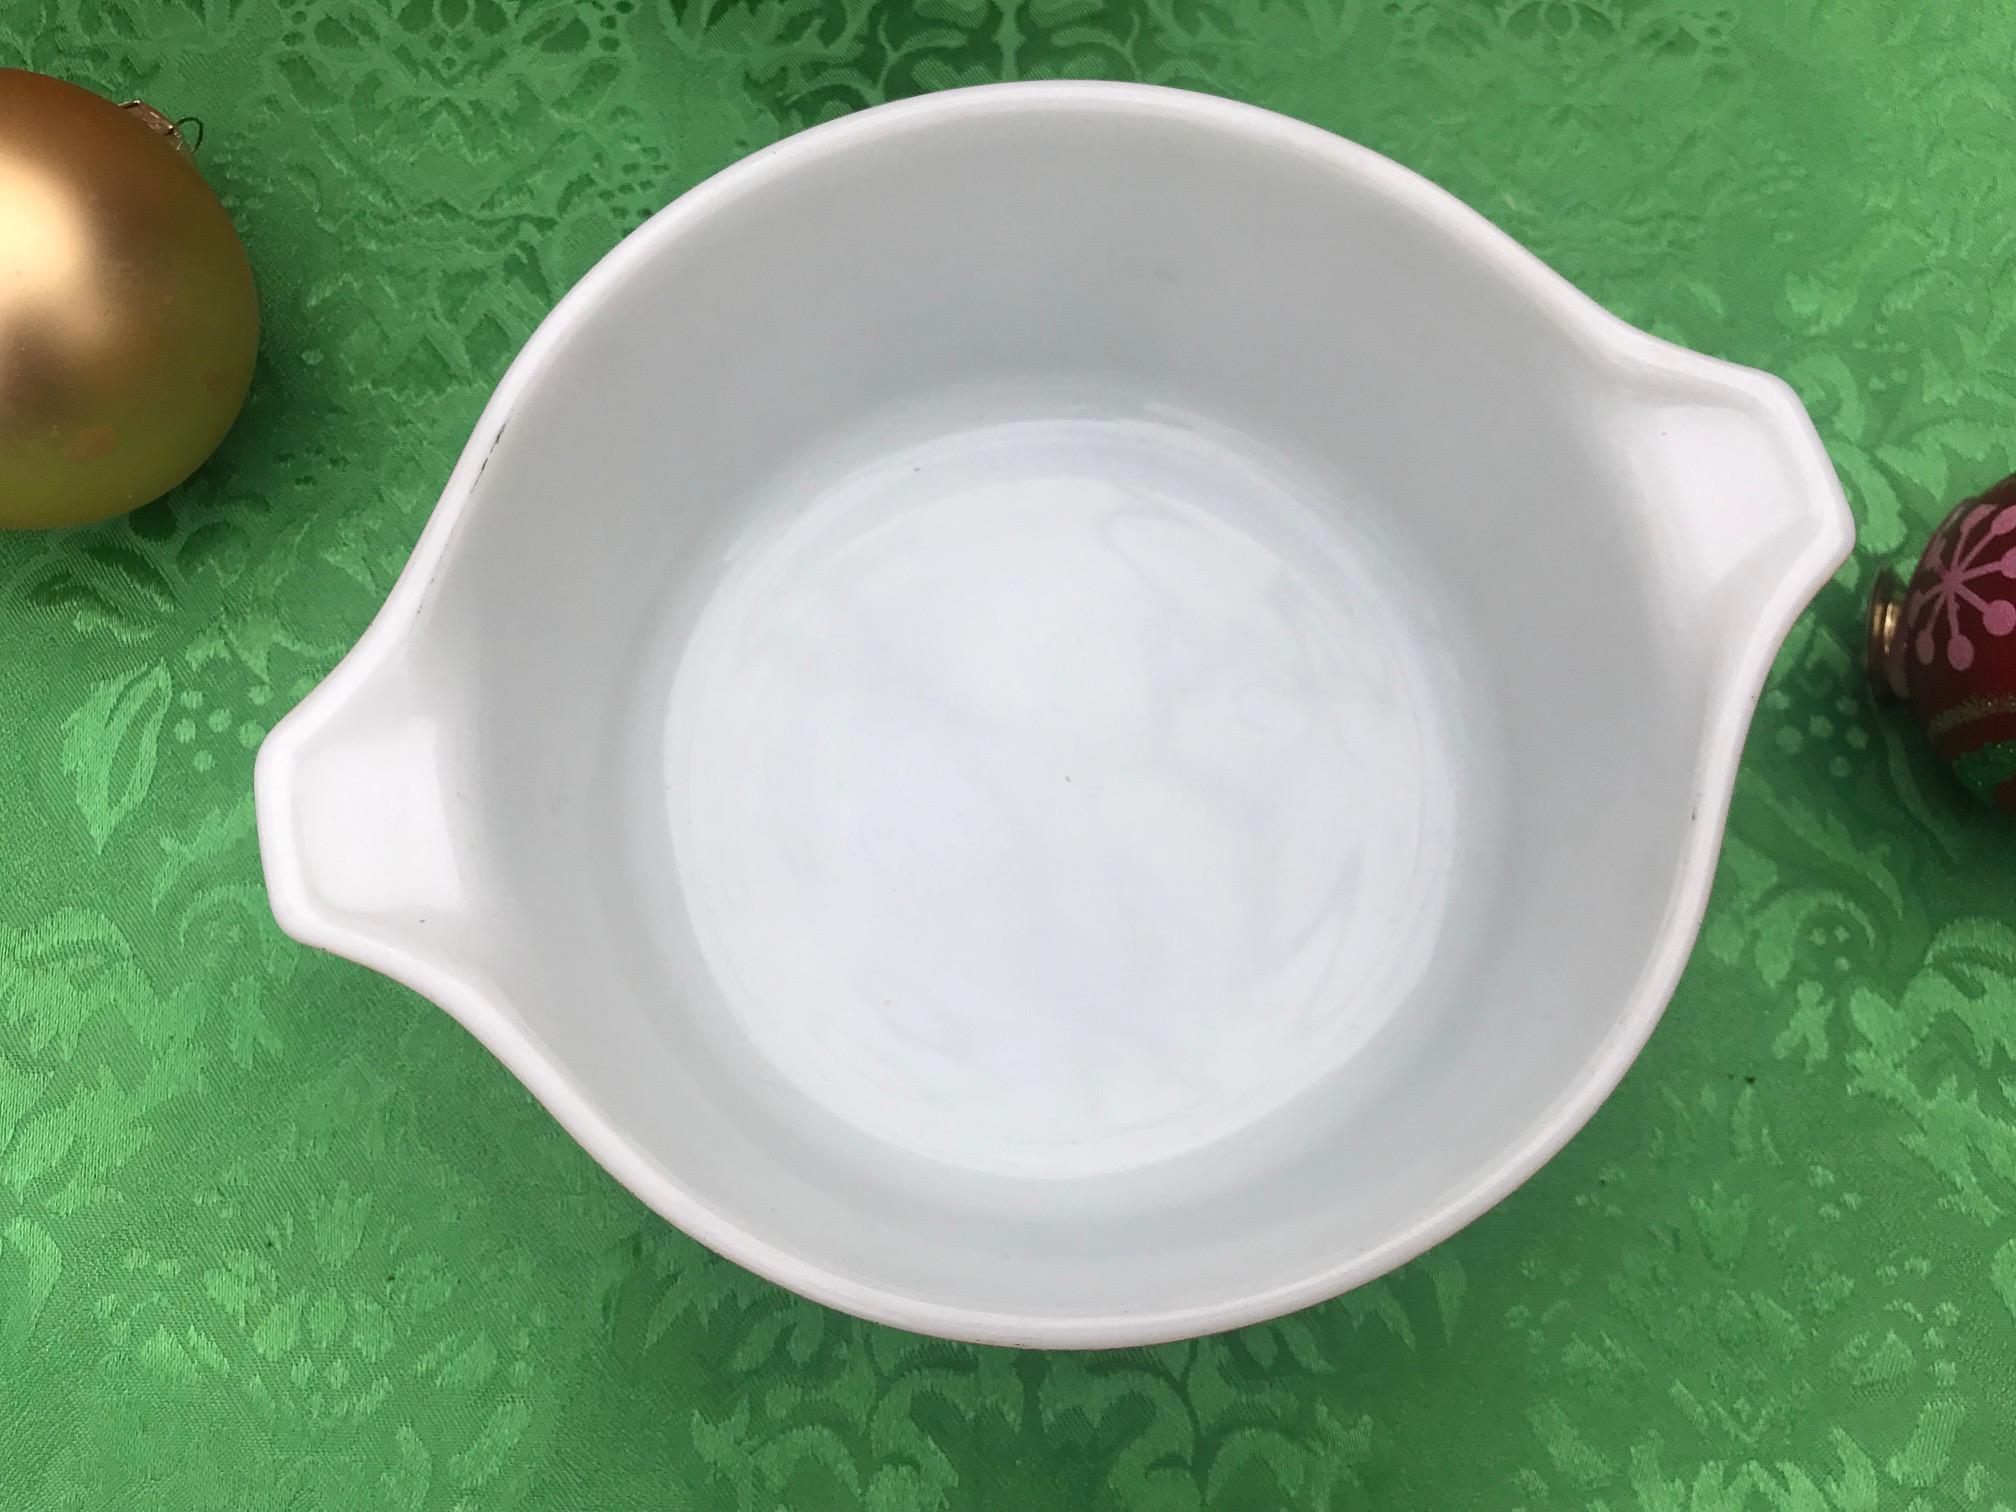 Vintage Pyrex Homestead (1976-1980) Design Milk Glass Casserole Dish: 209,900 ppm Lead + 9,009 ppm Cadmium + 9,252 ppm Arsenic